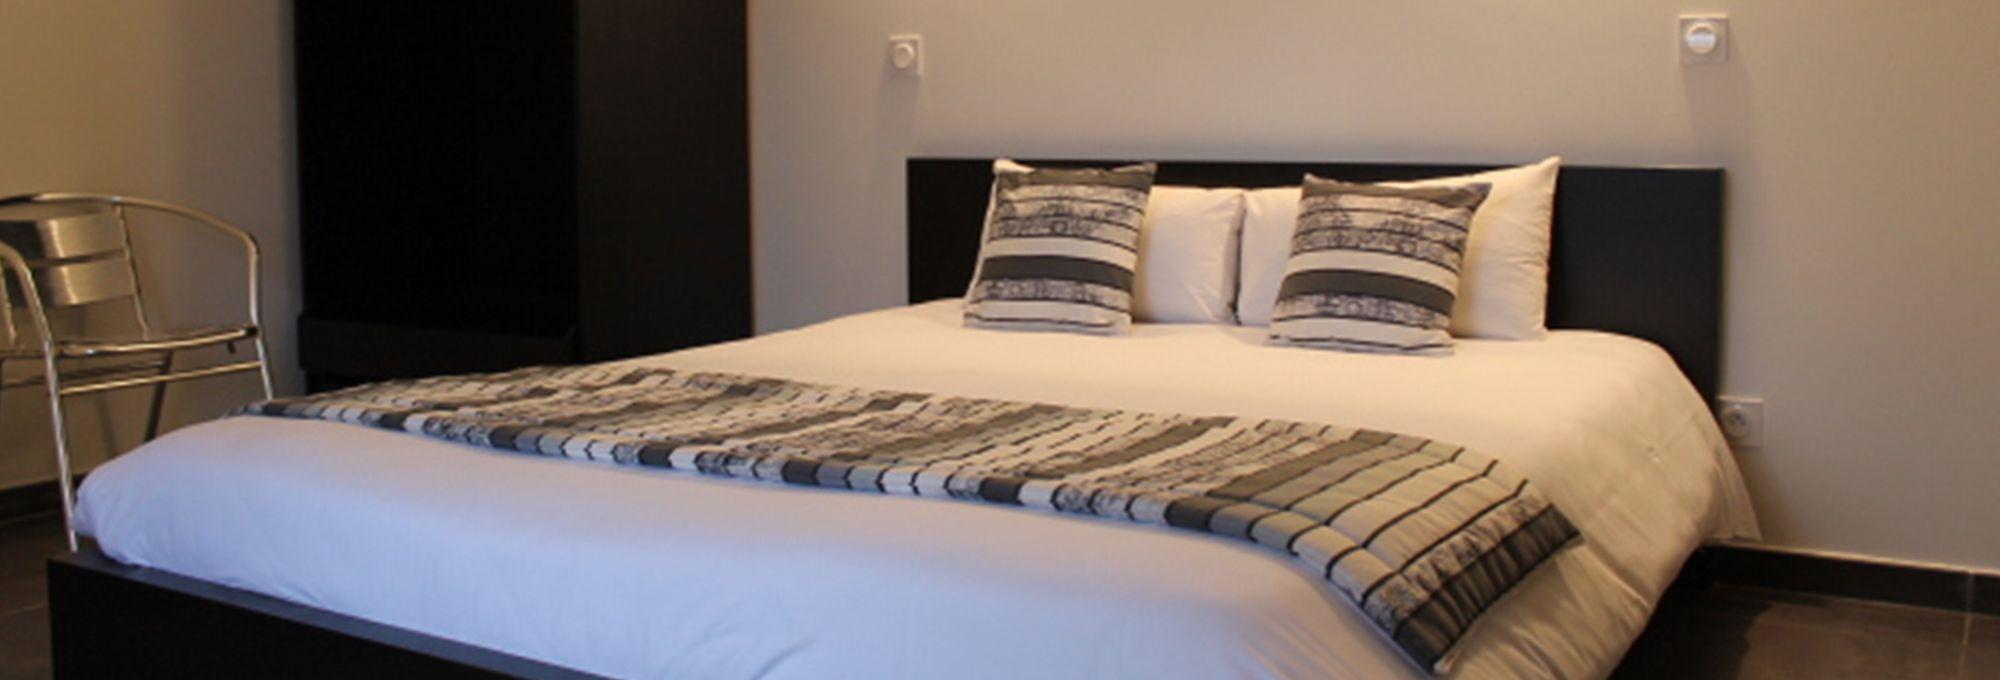 Brit Hotel Guinguet' L'Arbresle